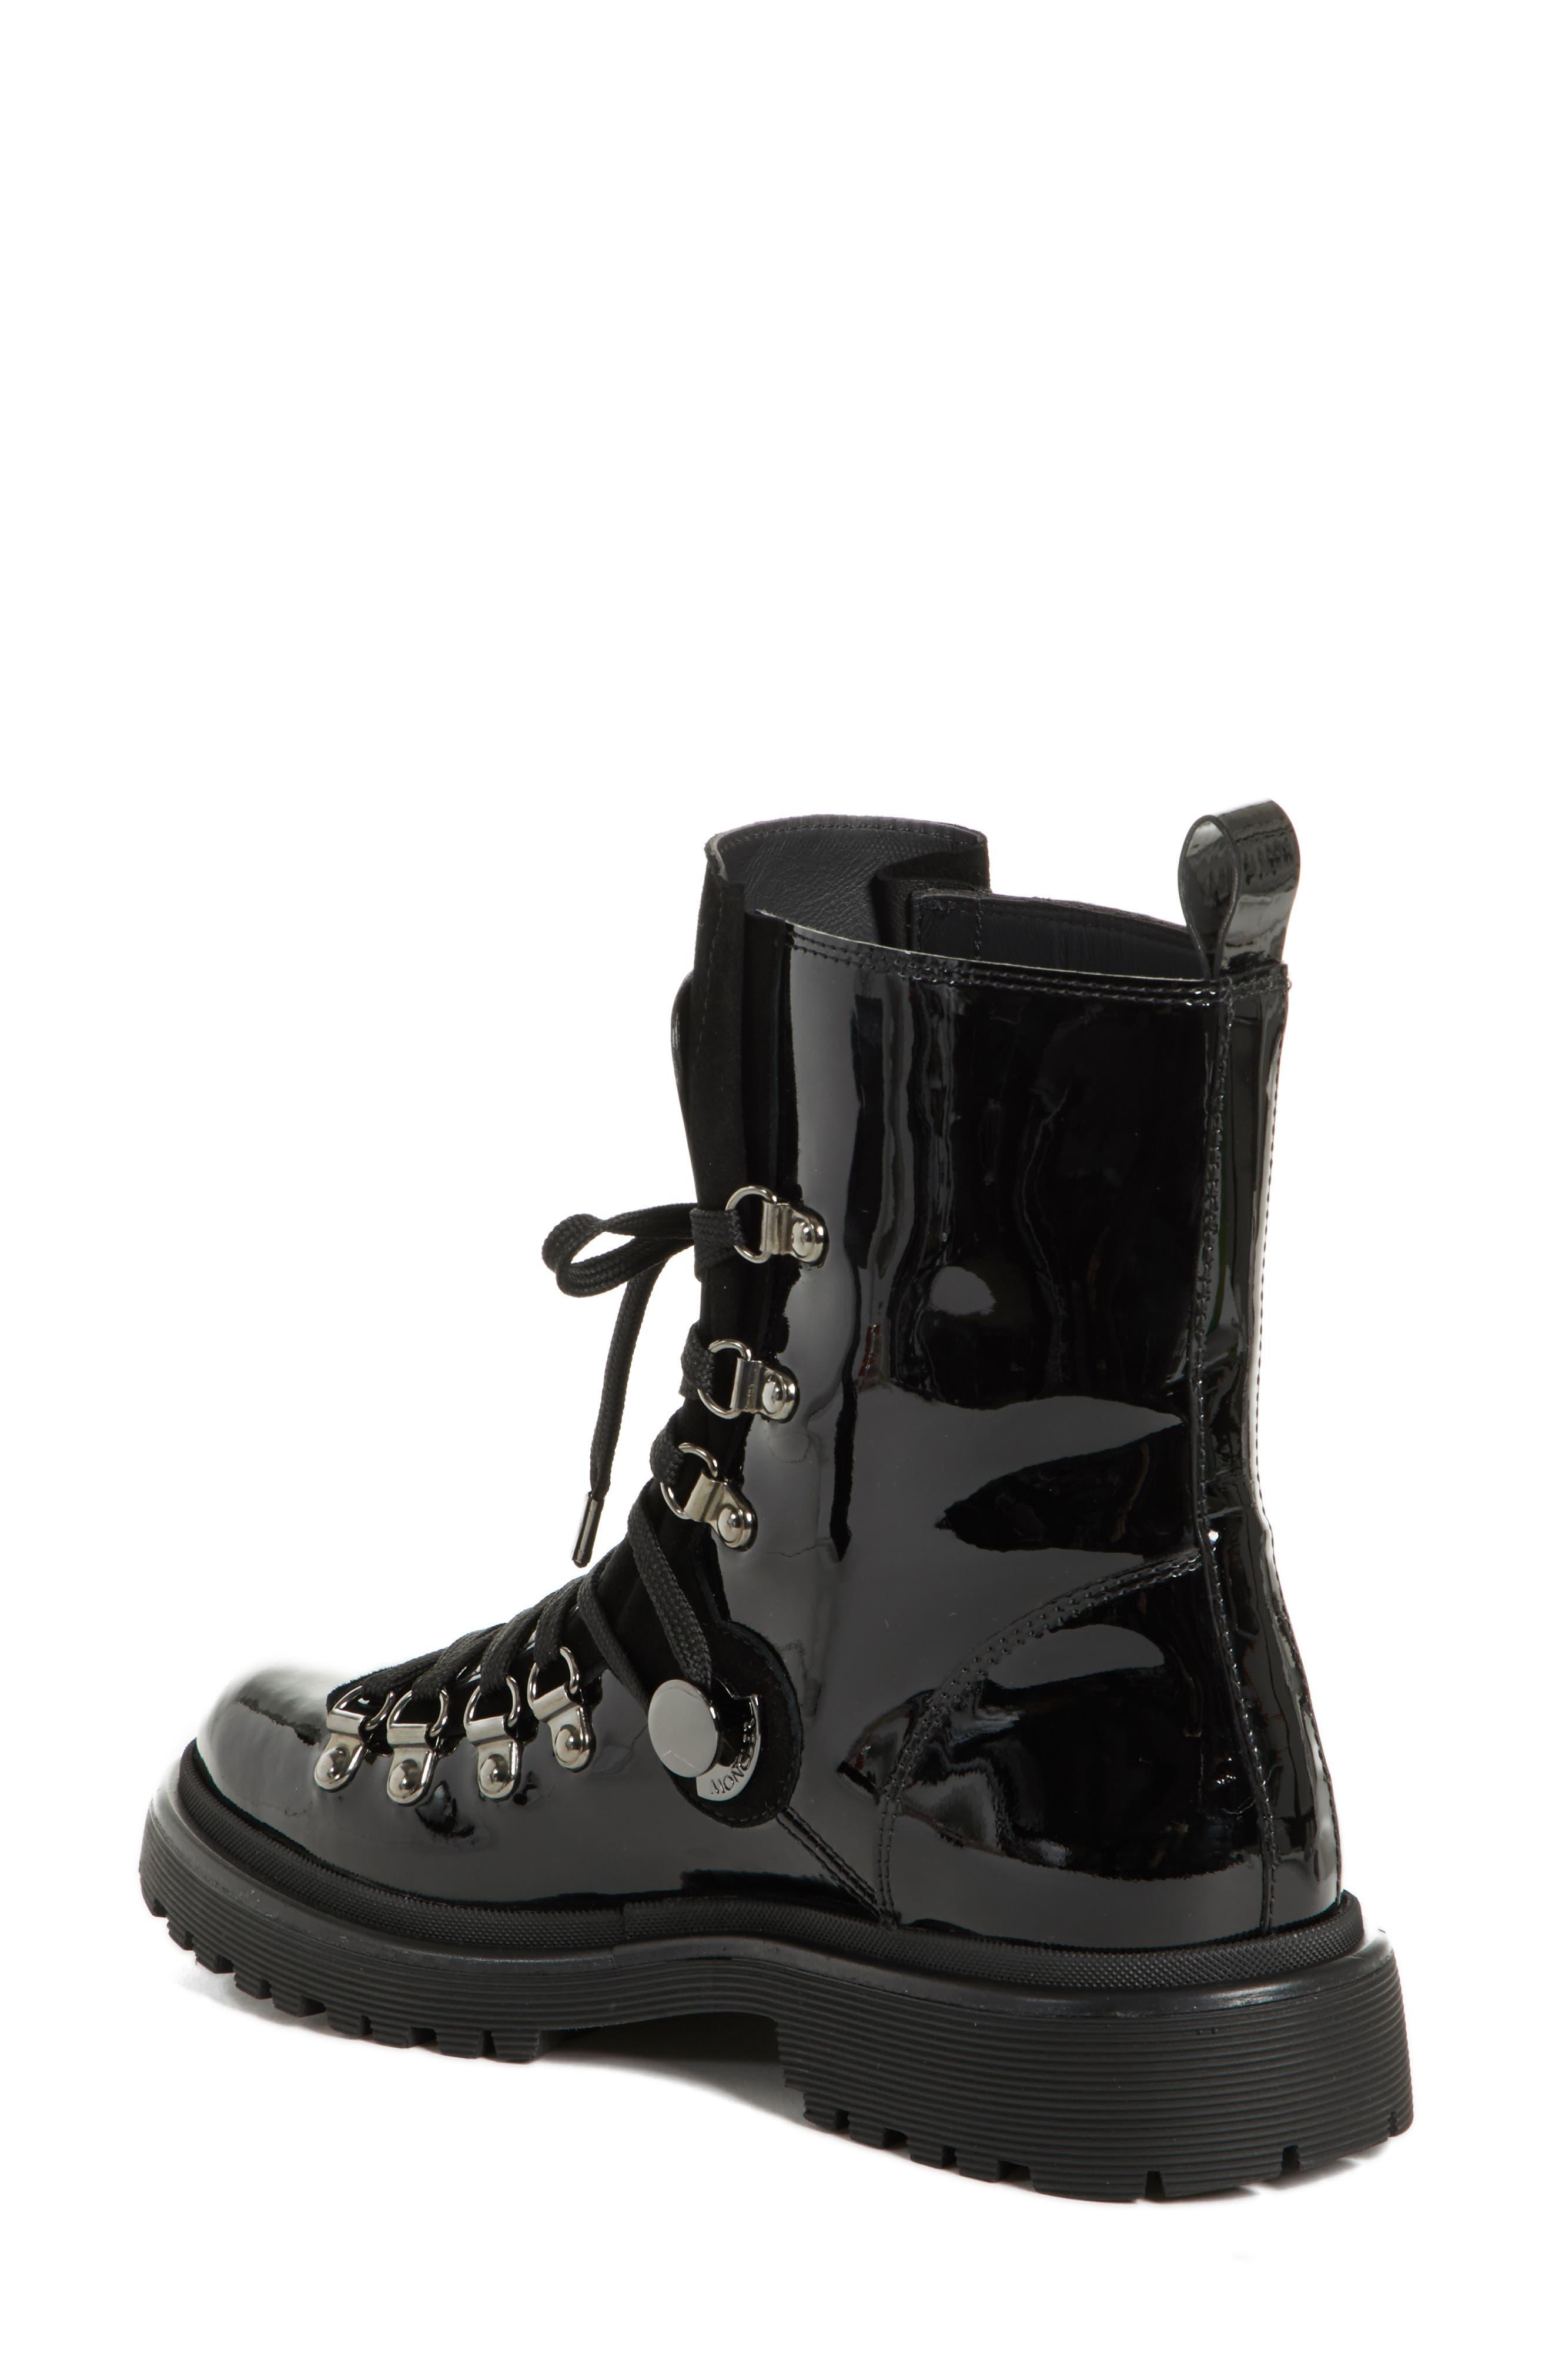 MONCLER, Berenice Stivale Lace-Up Boot, Alternate thumbnail 2, color, BLACK PATENT